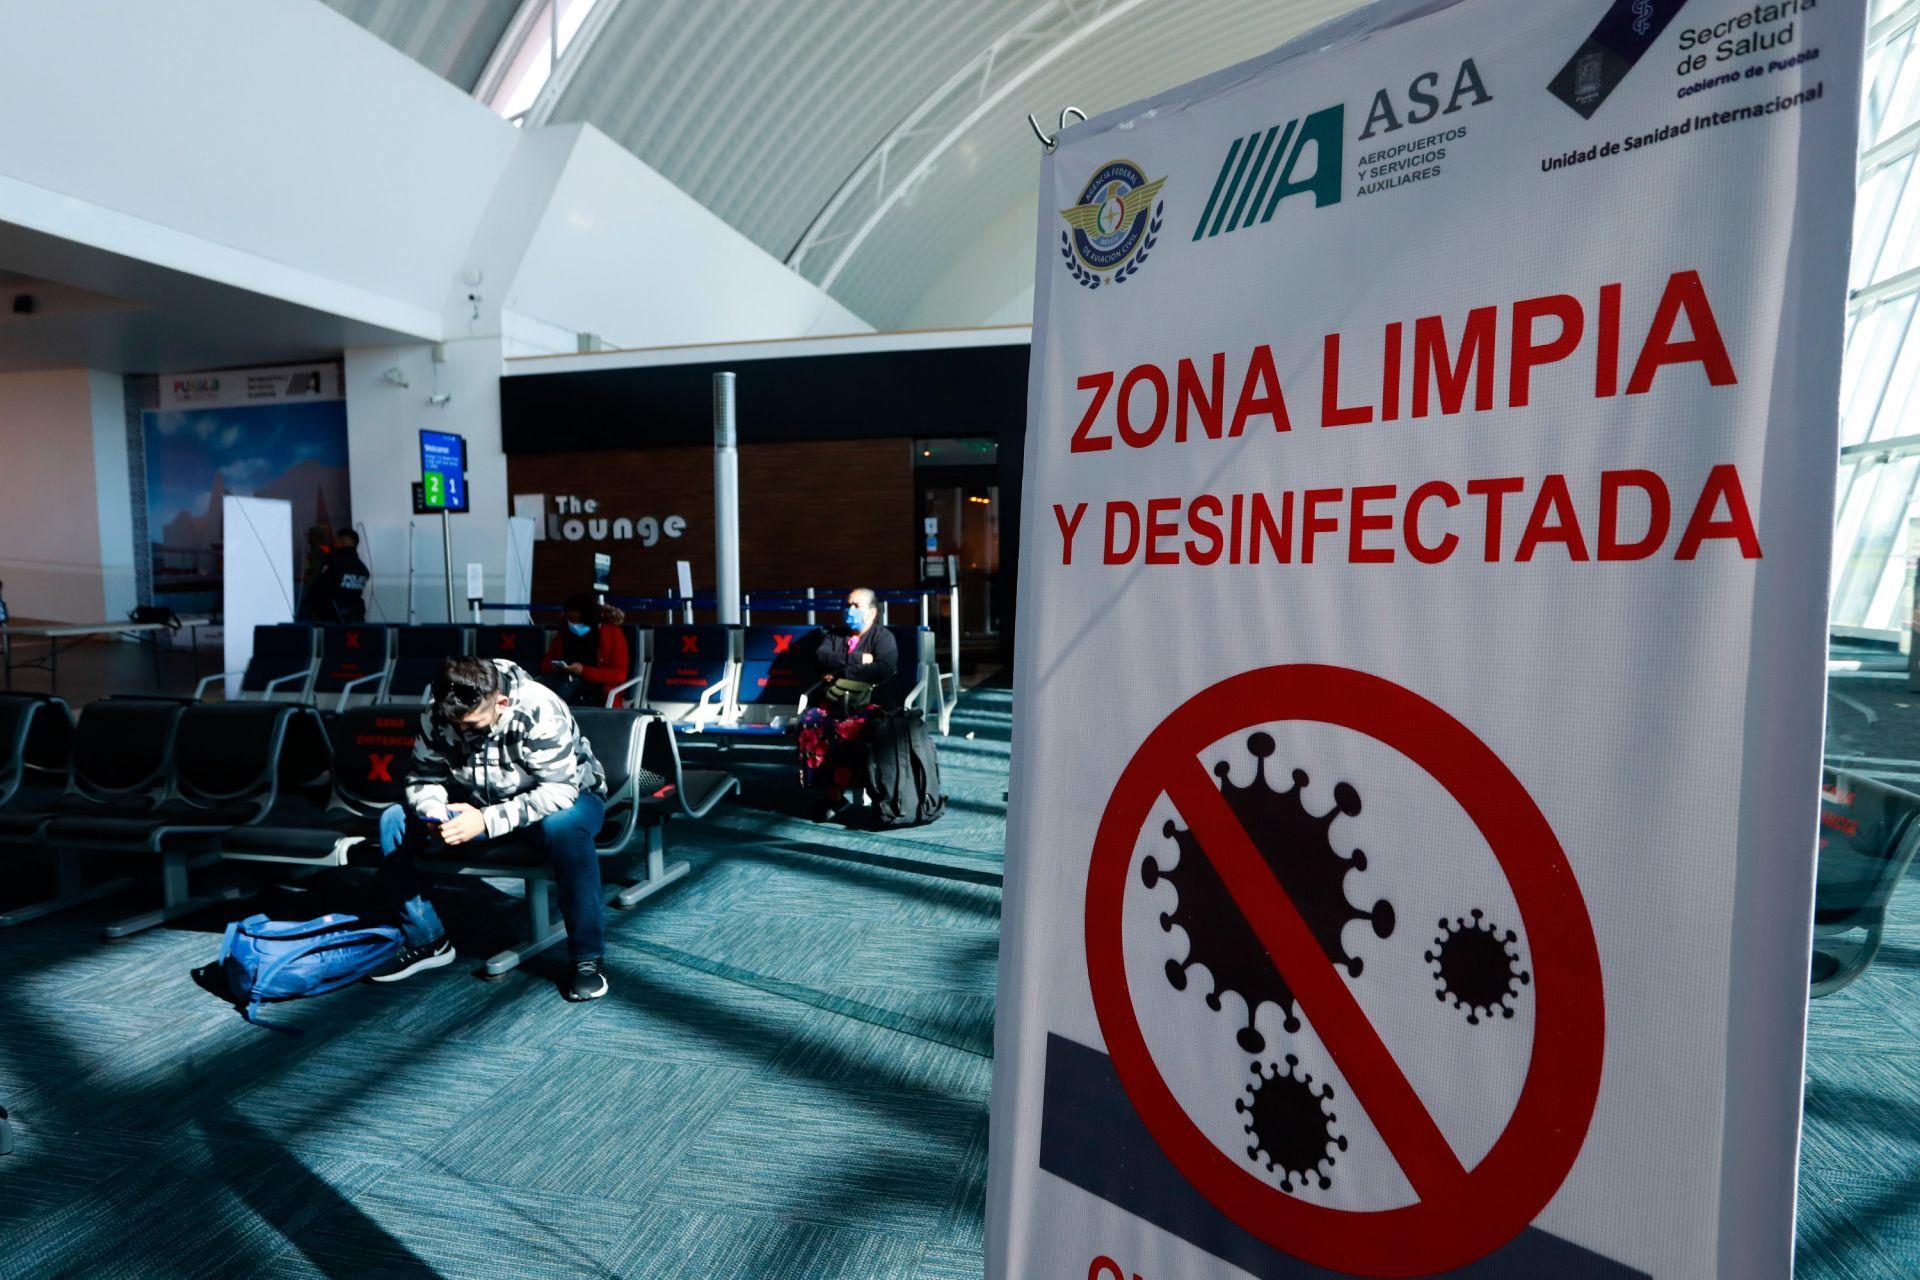 La nueva cepa de coronavirus llegó a México: Confirman un caso en Tamaulipas